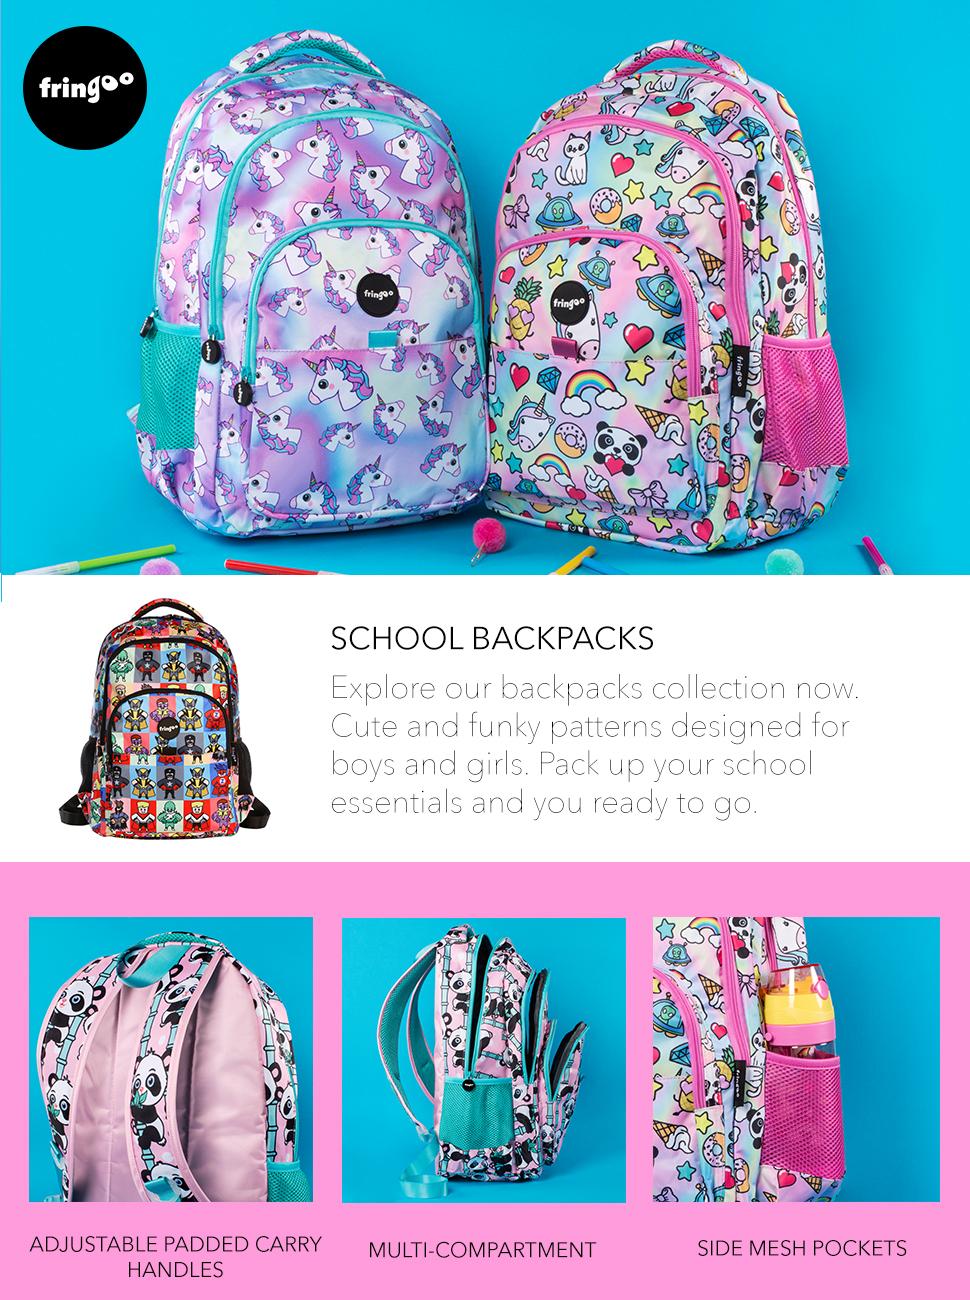 627d1bb42f7a FRINGOO® Girls Boys Multi-compartment School Backpack Waterproof ...